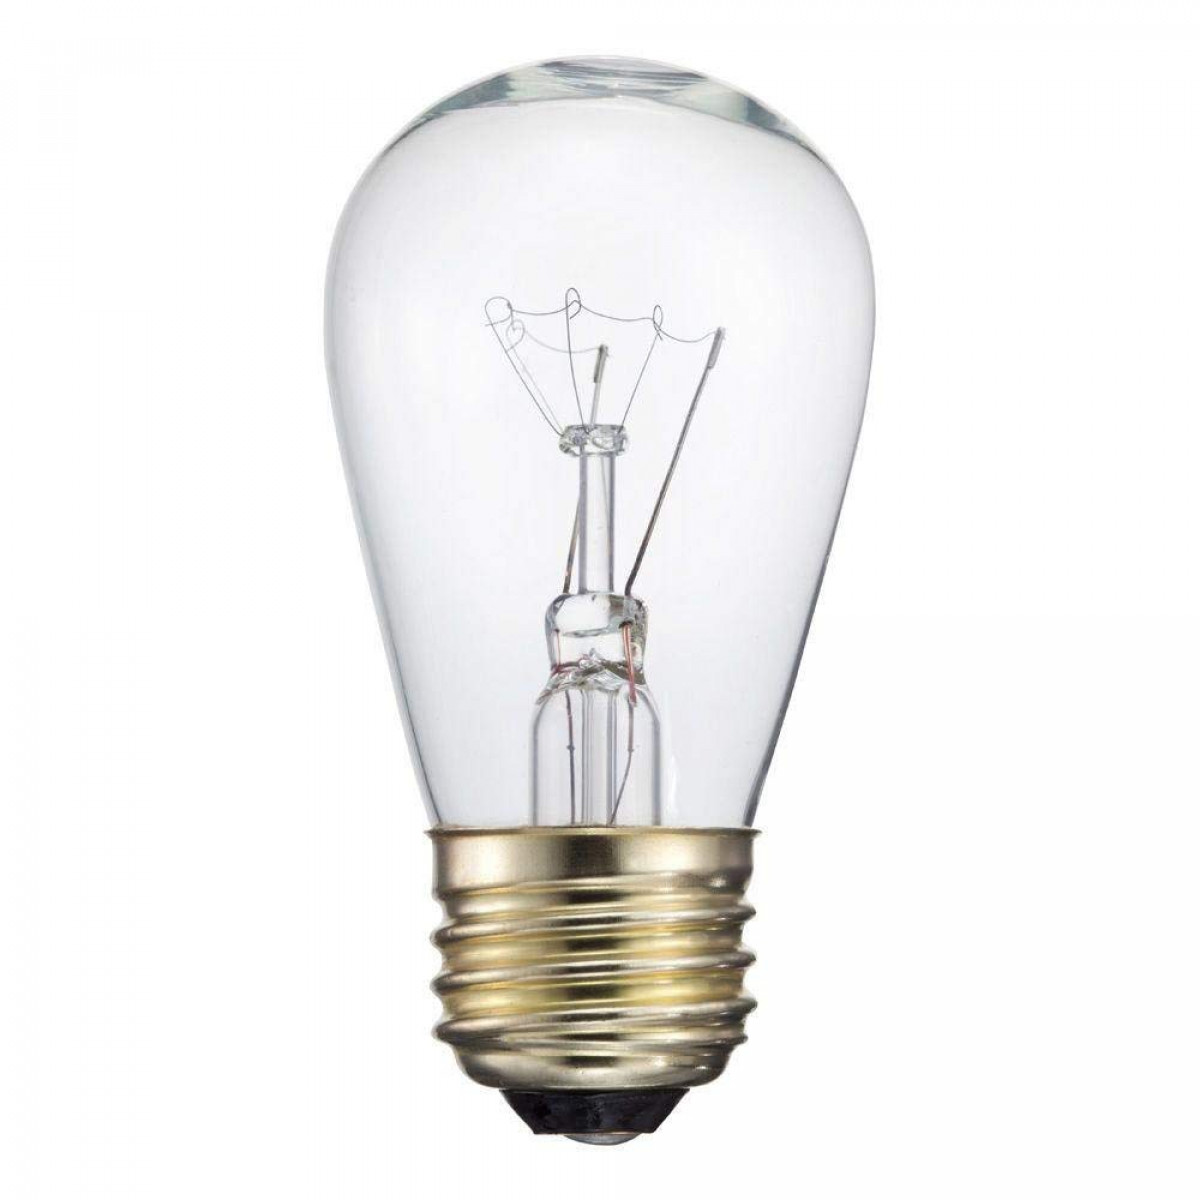 Box of 25 S14 CLEAR 11 Watt E26 Base Replacement Bulbs